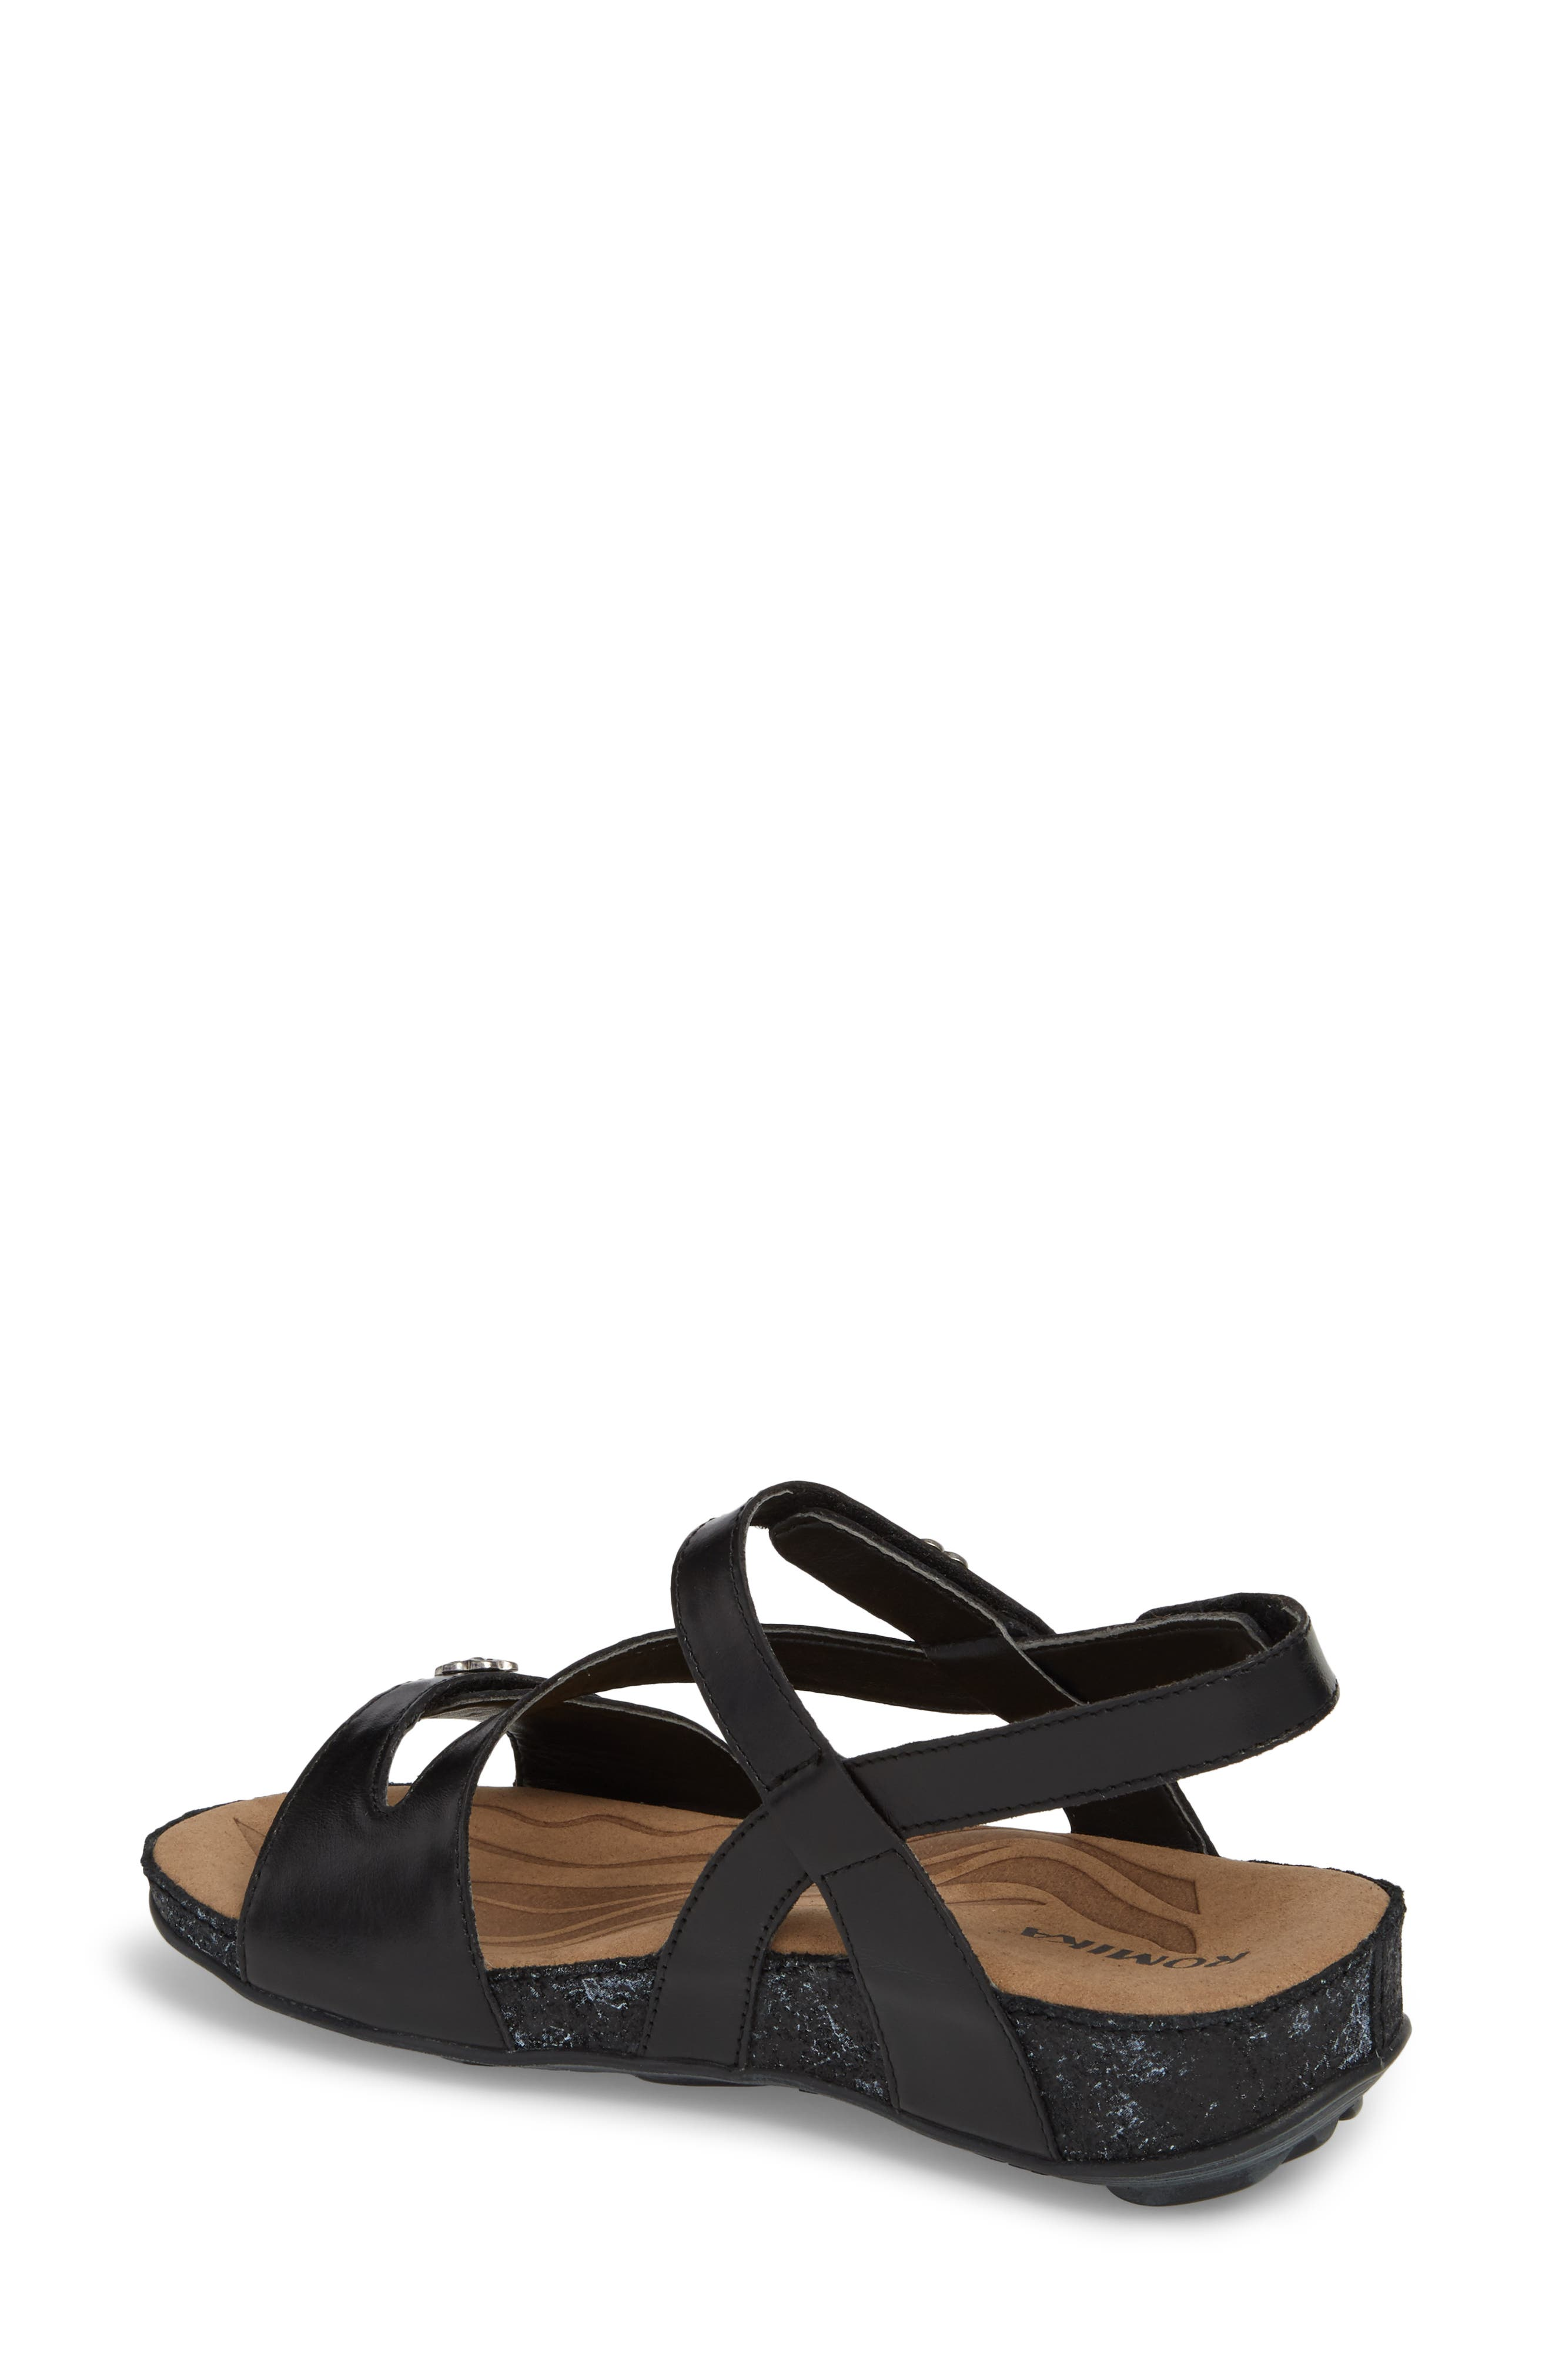 ROMIKA<SUP>®</SUP>, Fidschi 54 Sandal, Alternate thumbnail 2, color, BLACK LEATHER